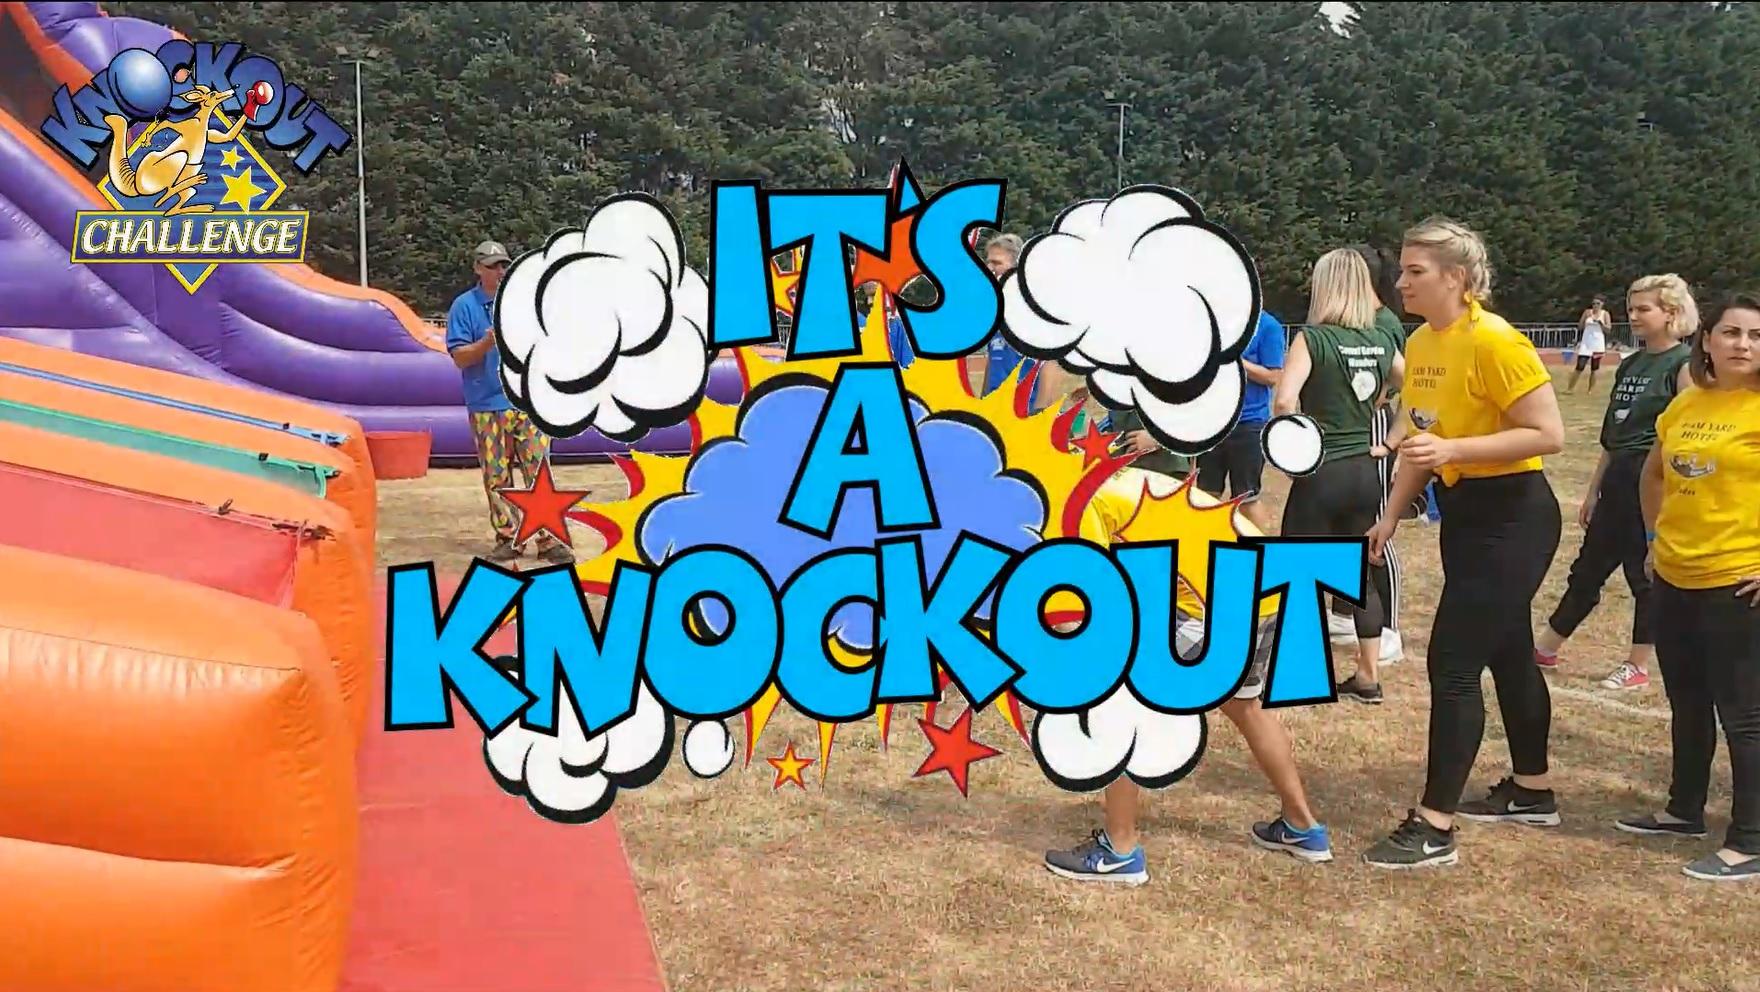 It's A Knockout Games Video Still